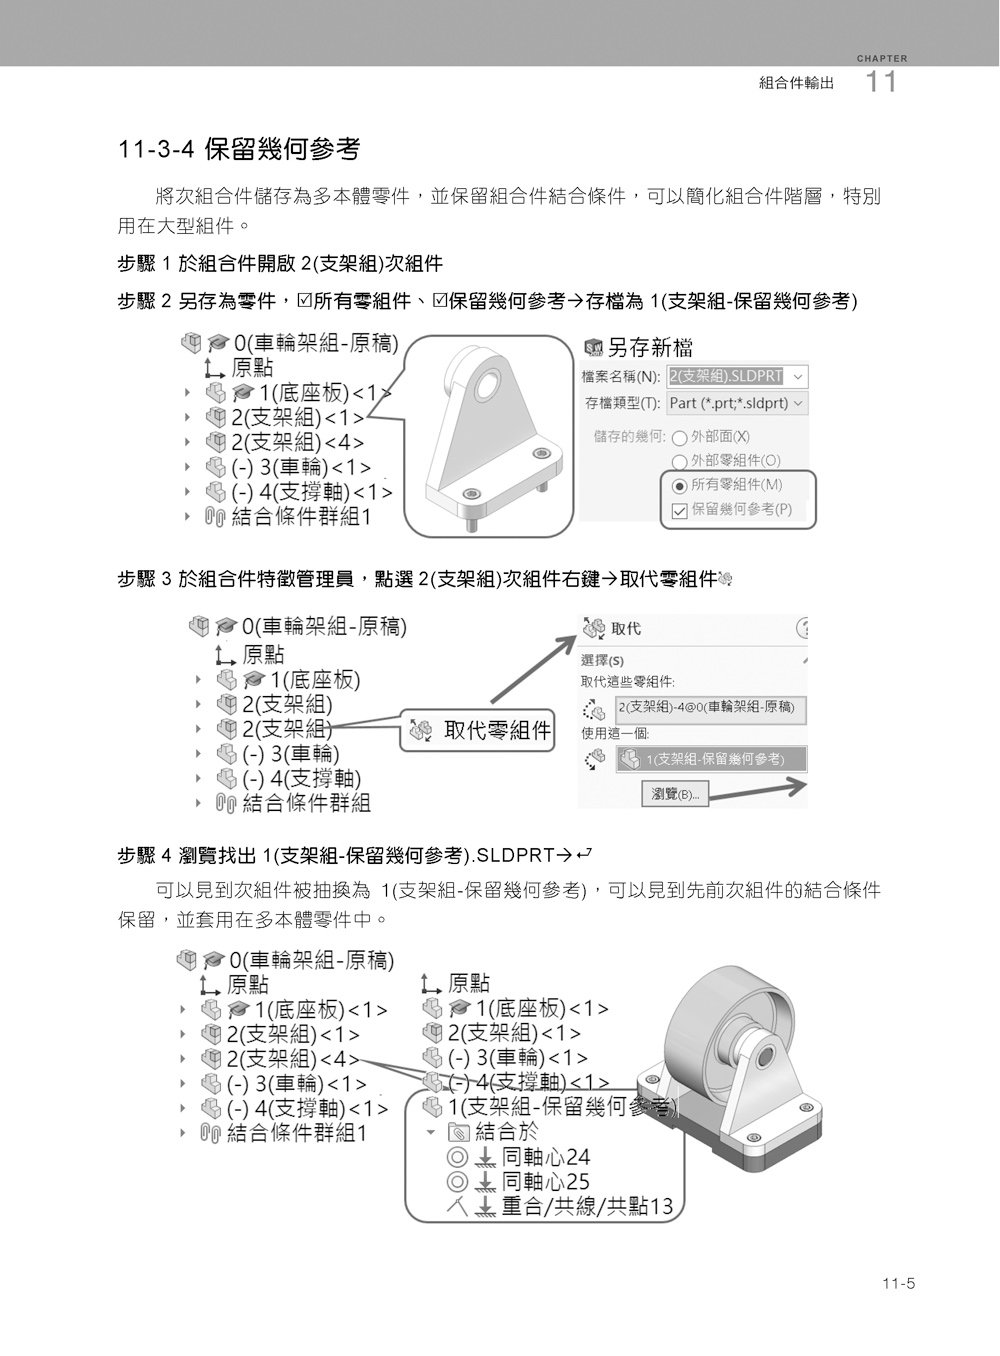 Solidworks 專業工程師訓練手冊[9]-模型轉檔與修復策略-preview-13